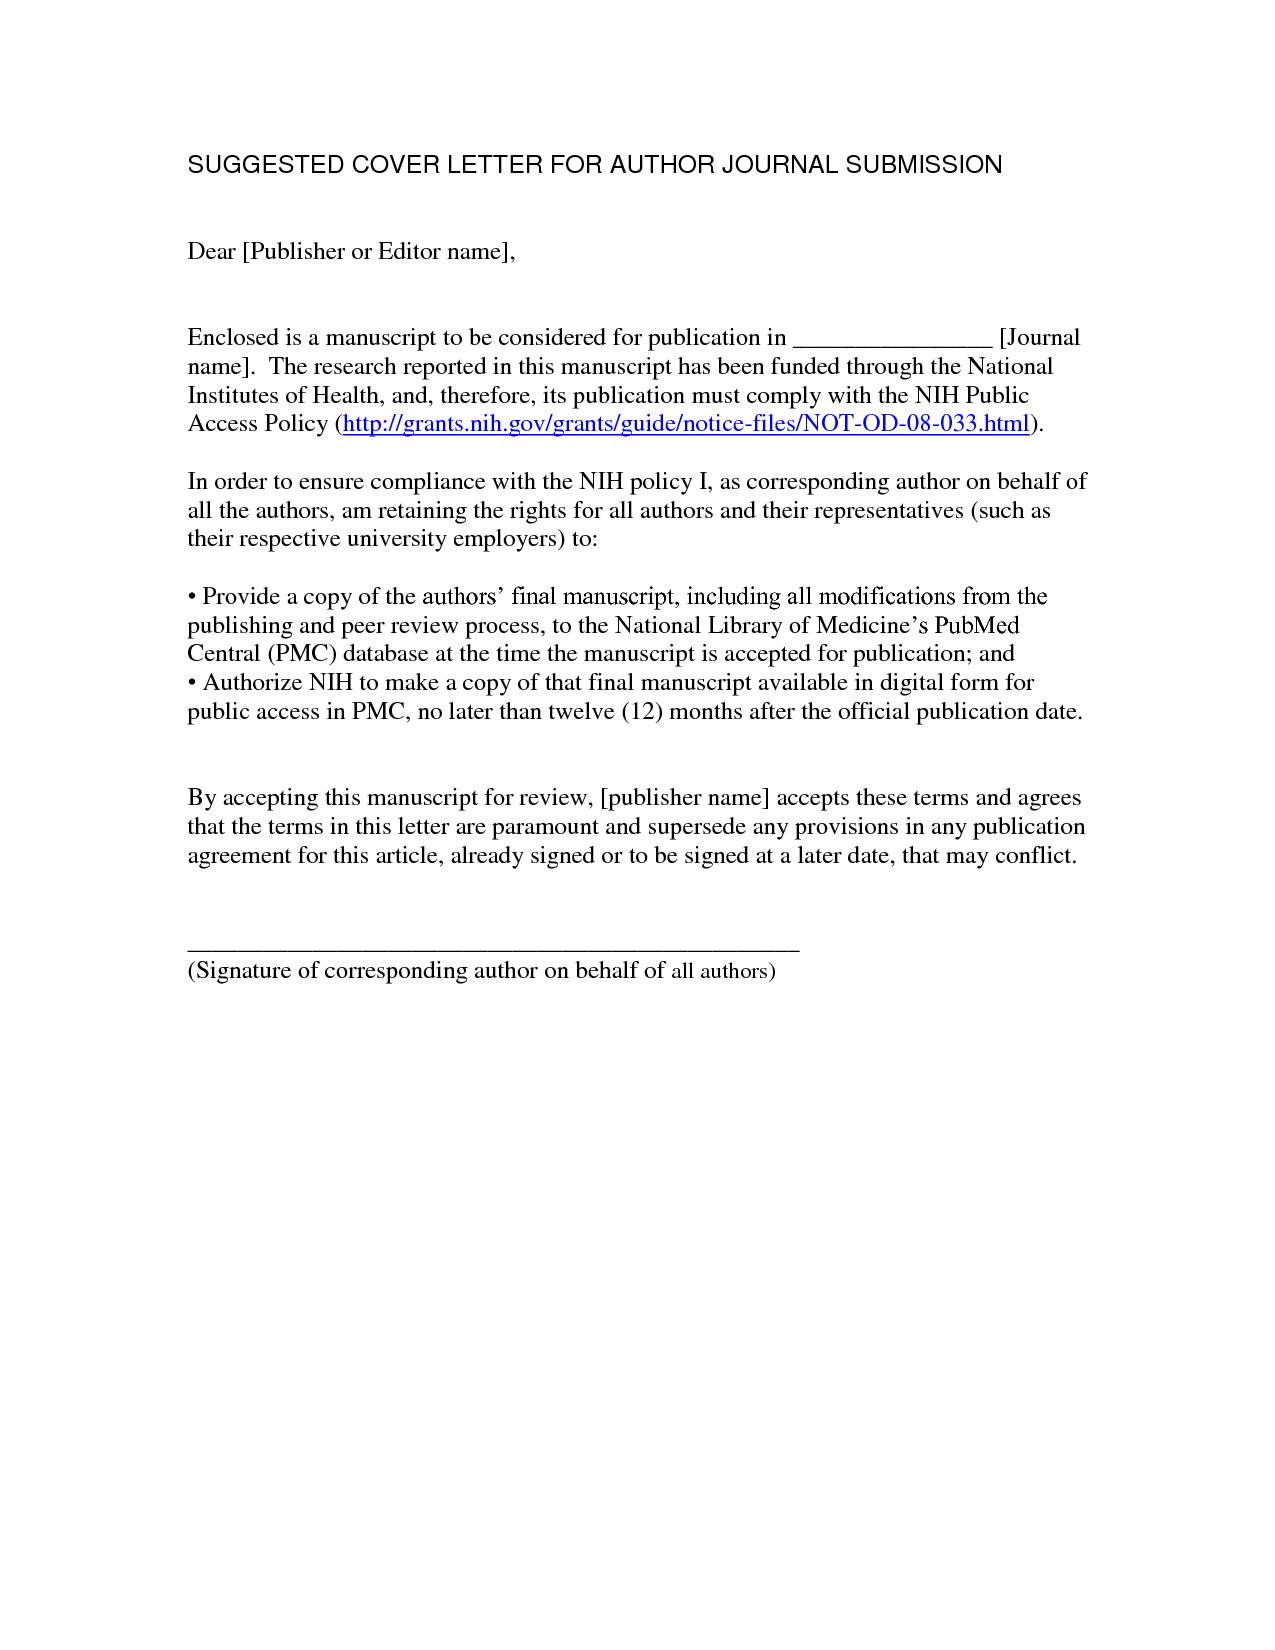 Scholarship Cover Letter Template - Scholarship Cover Letter Example Fresh order Front Desk Receptionist